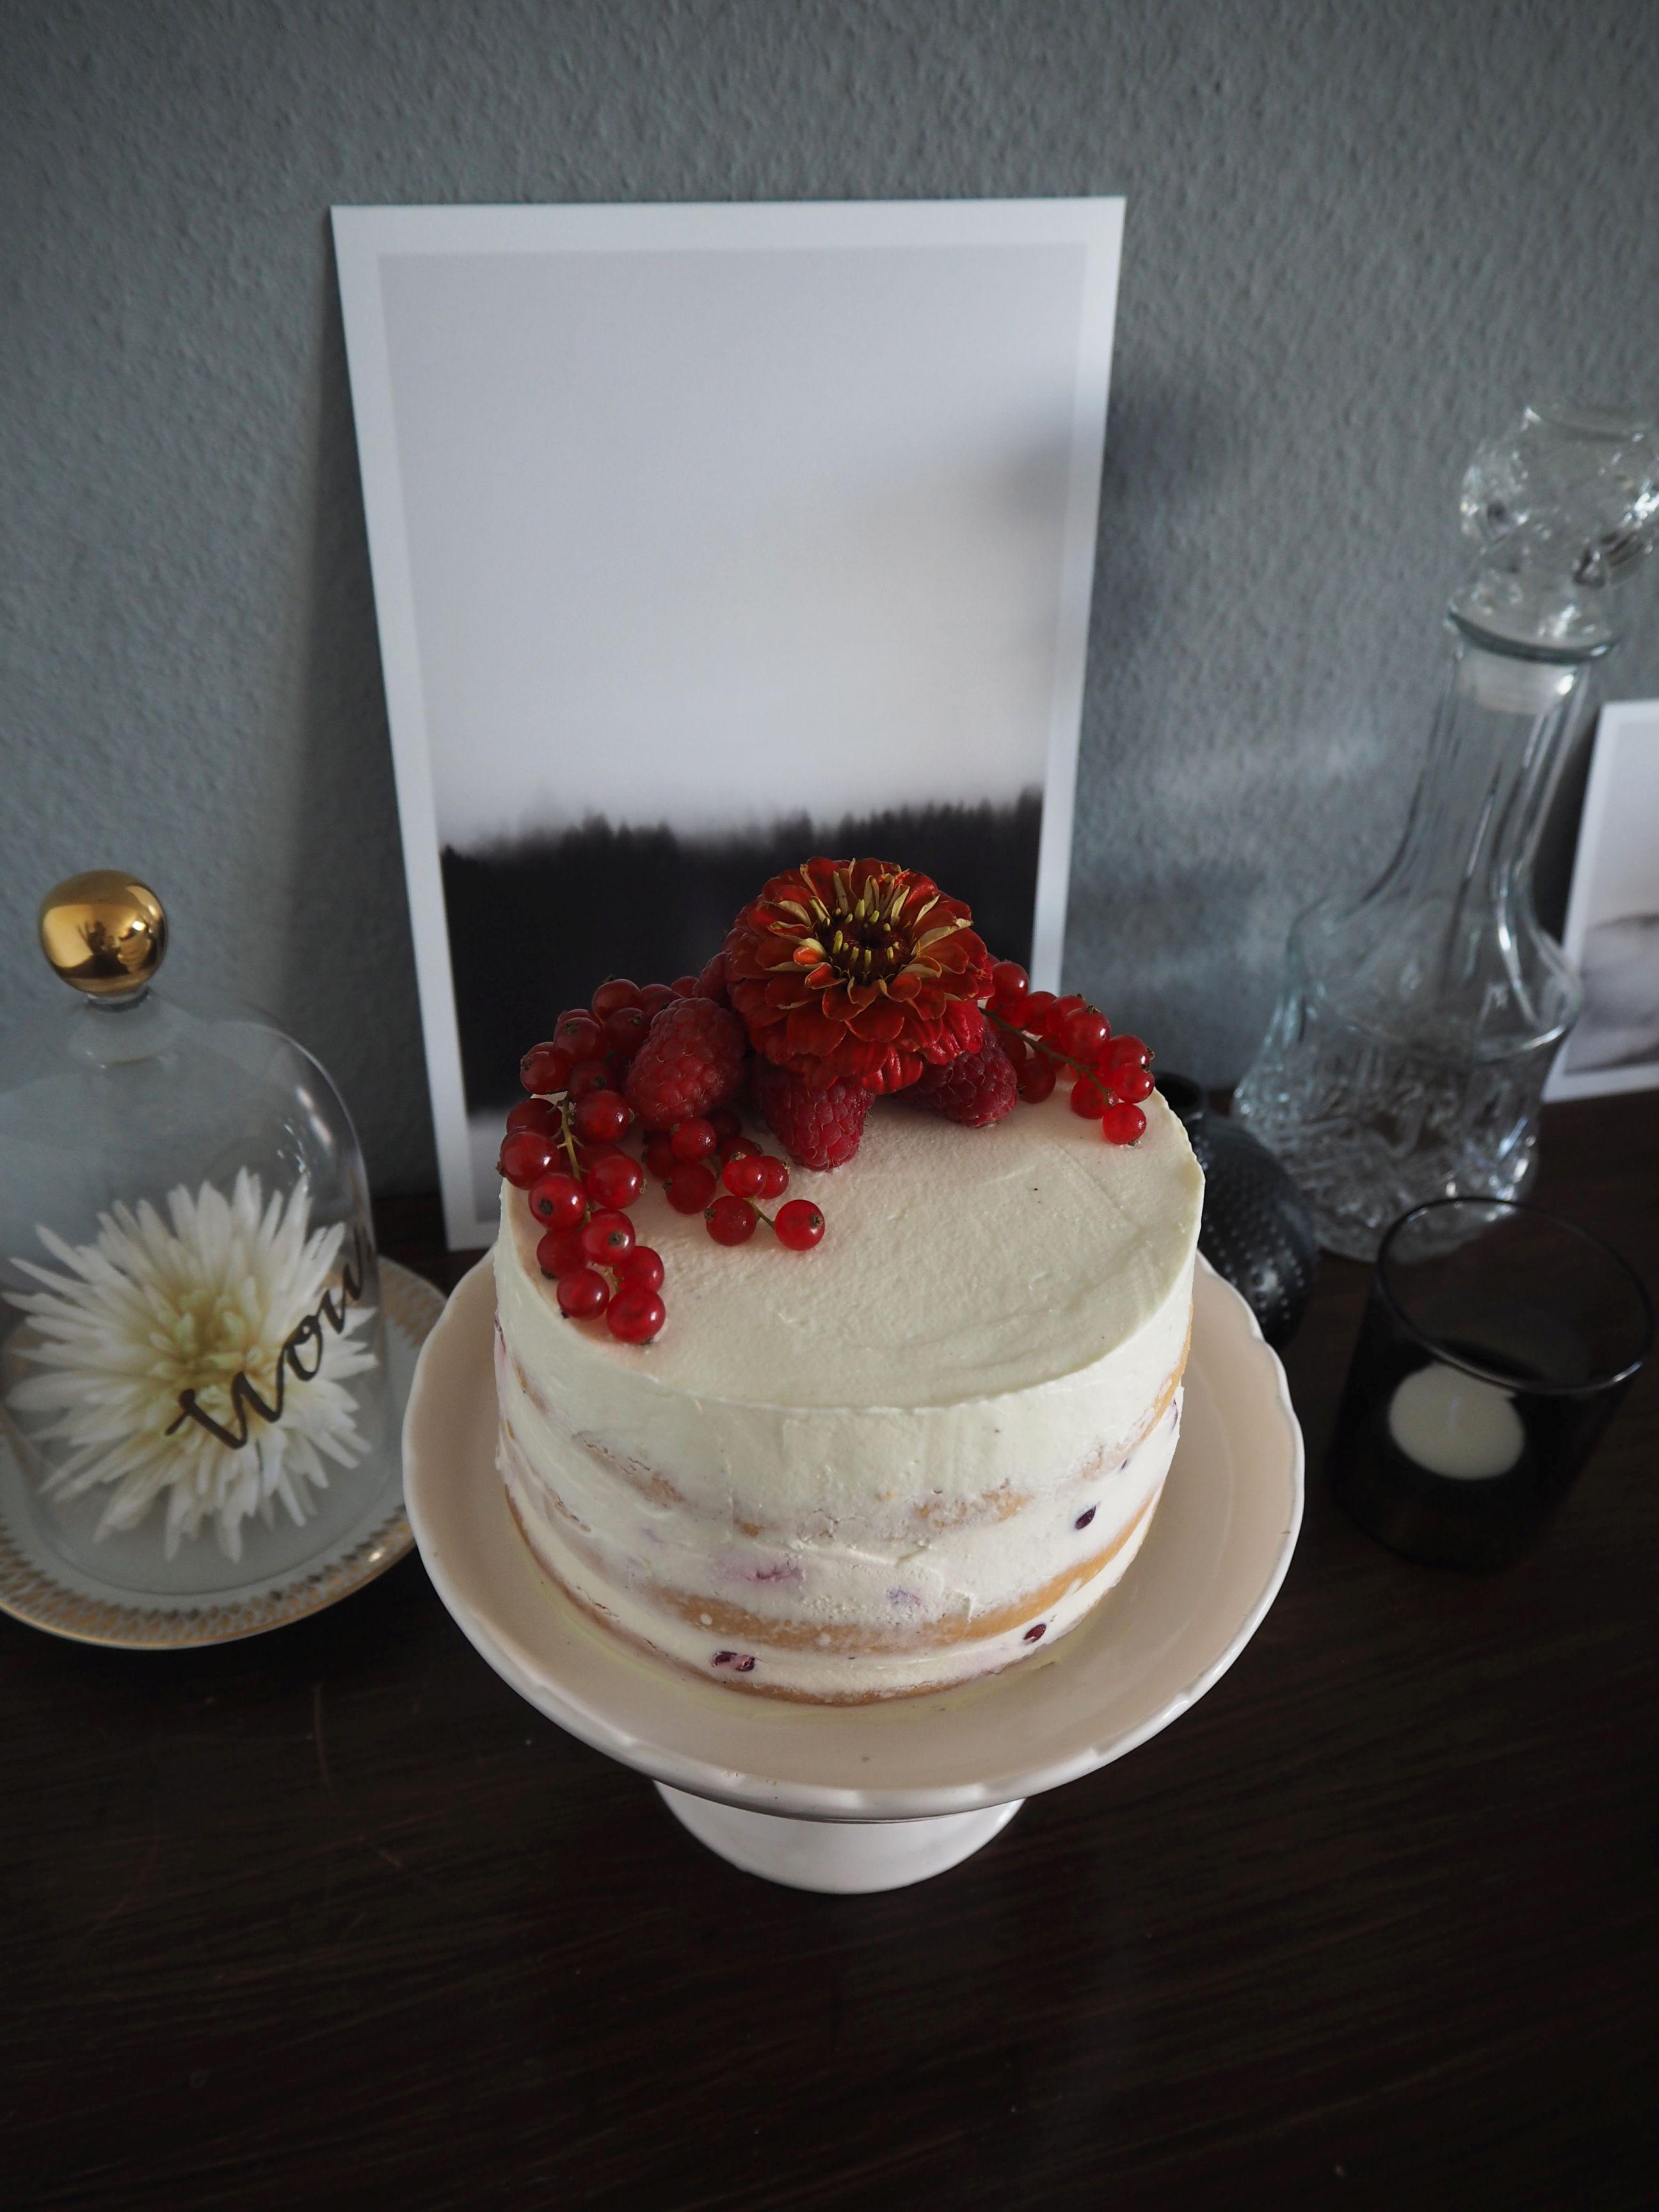 2018-05-skoen-och-kreativ-foodberry-semi-naked-cake-beeren-torte-zum-muttertag (3)